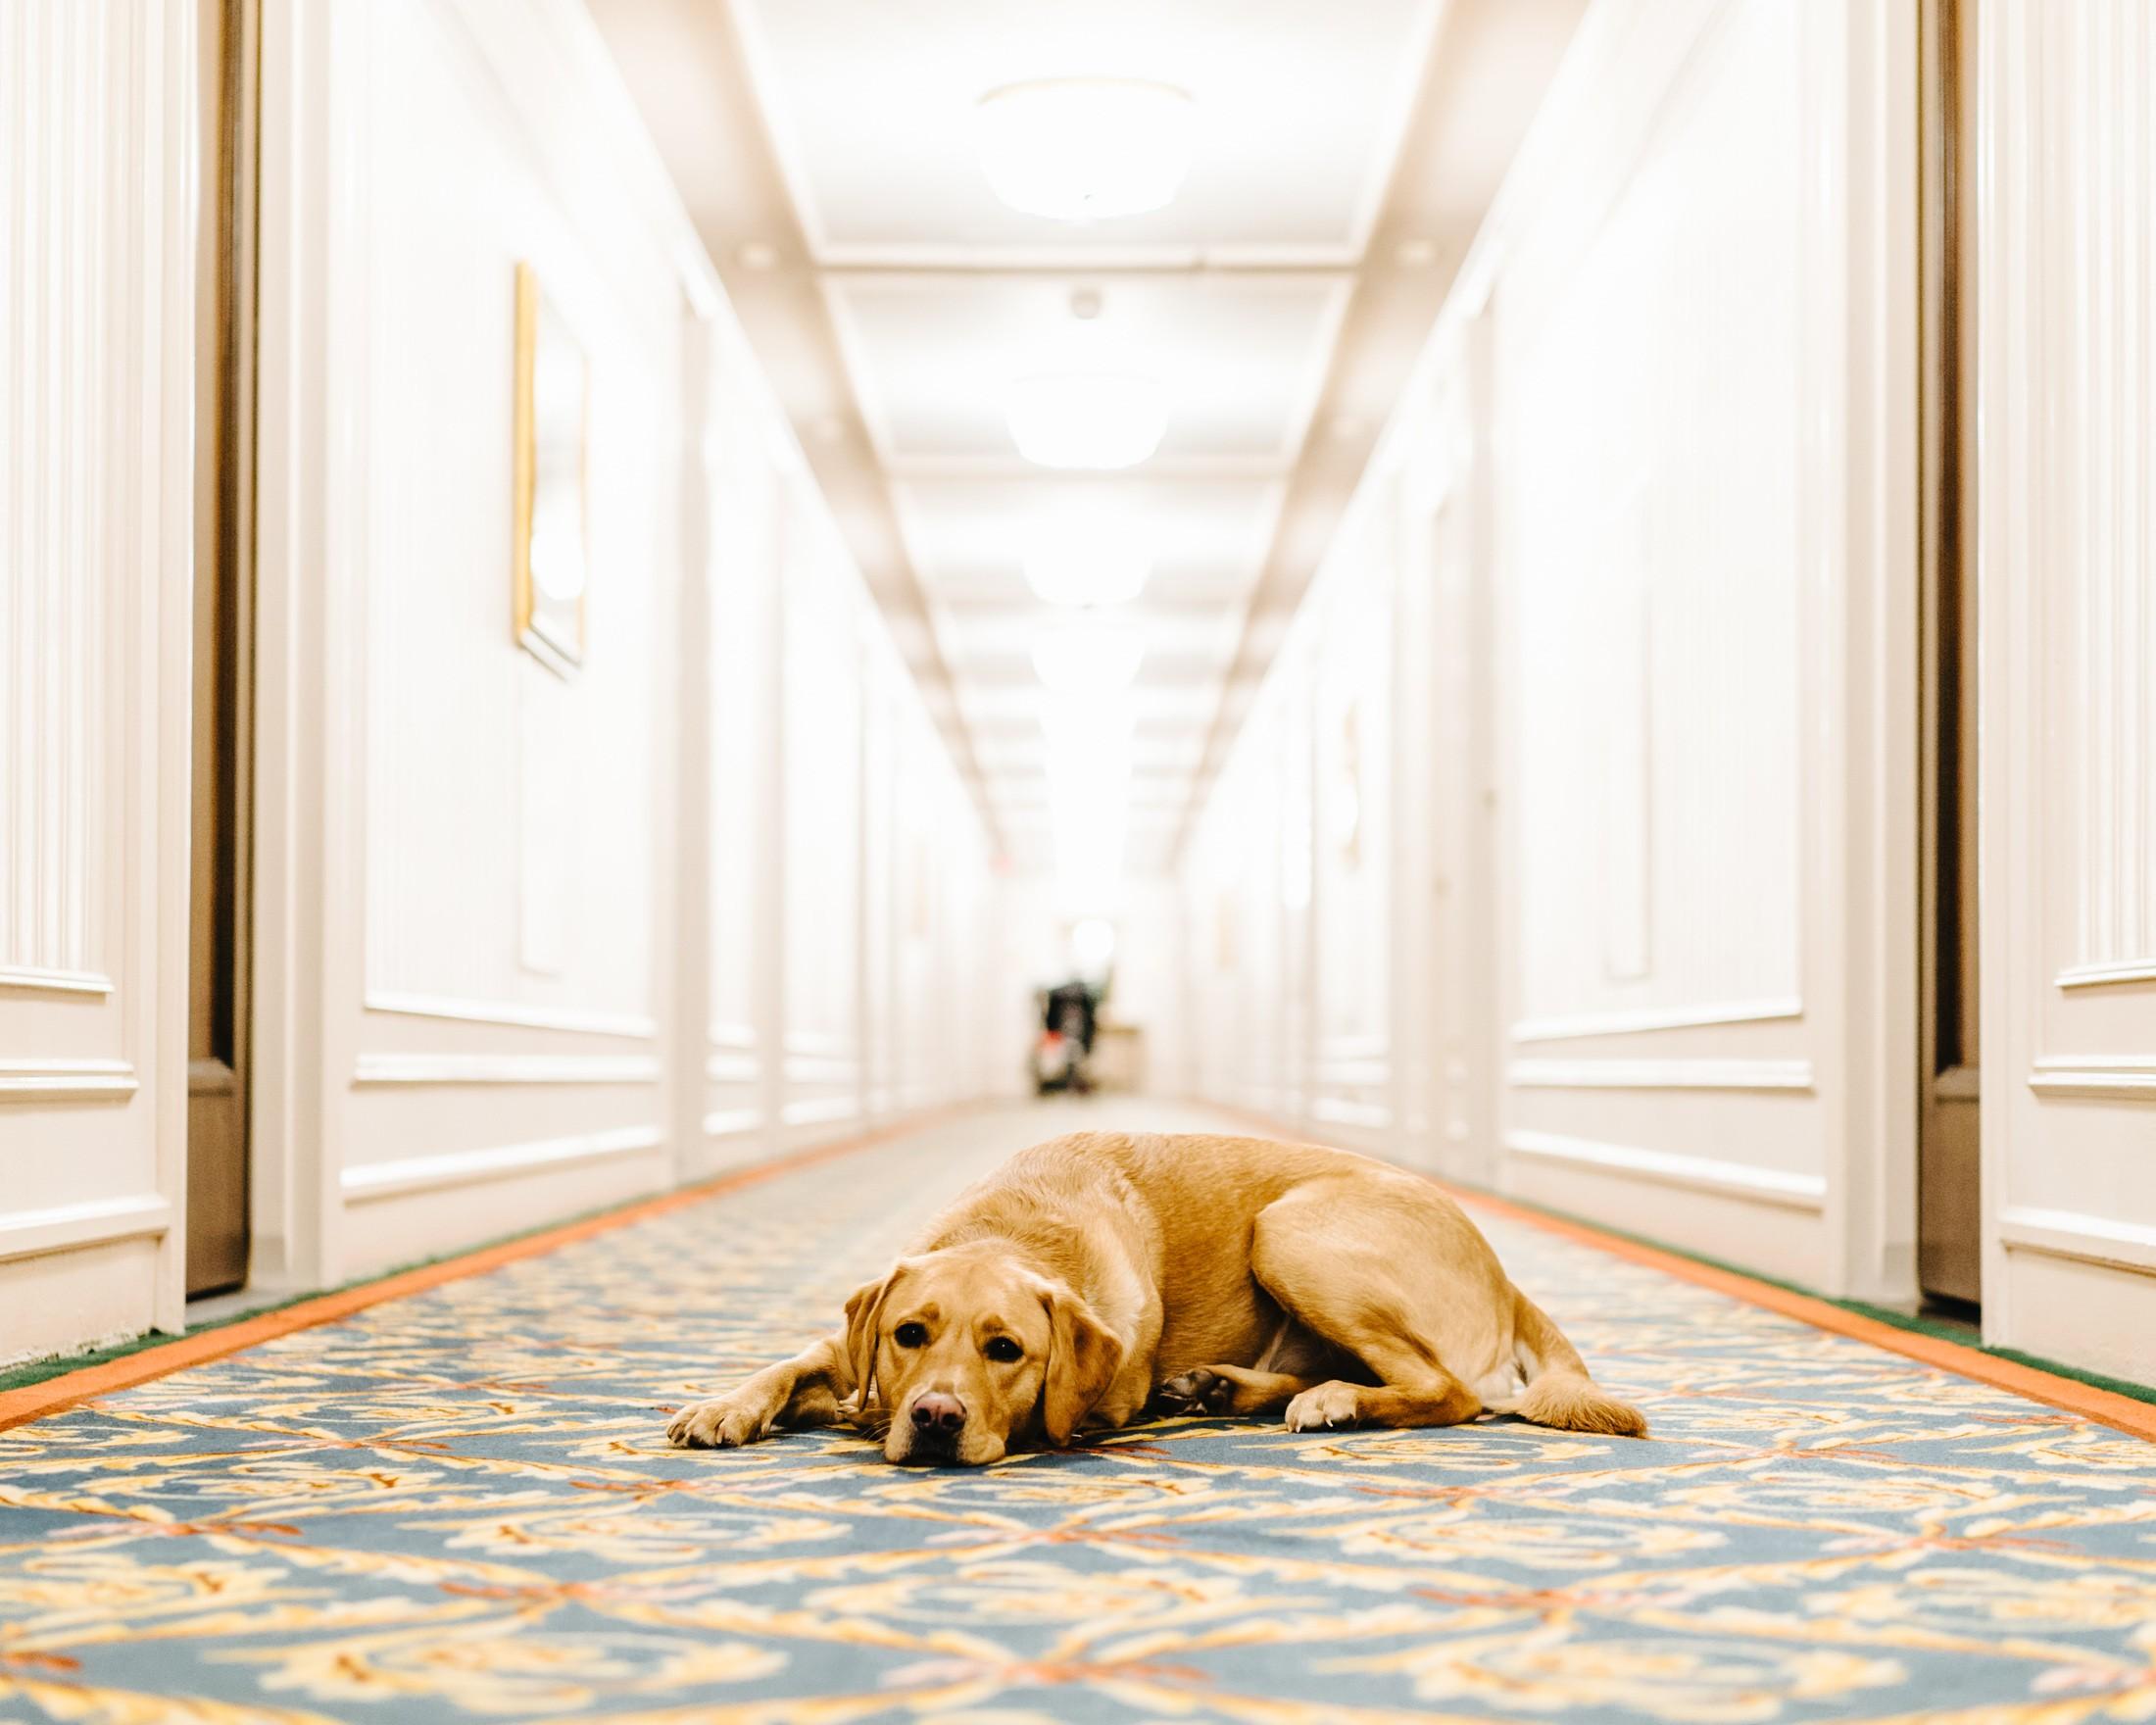 The Fairmont's Canine Ambassador, Ella